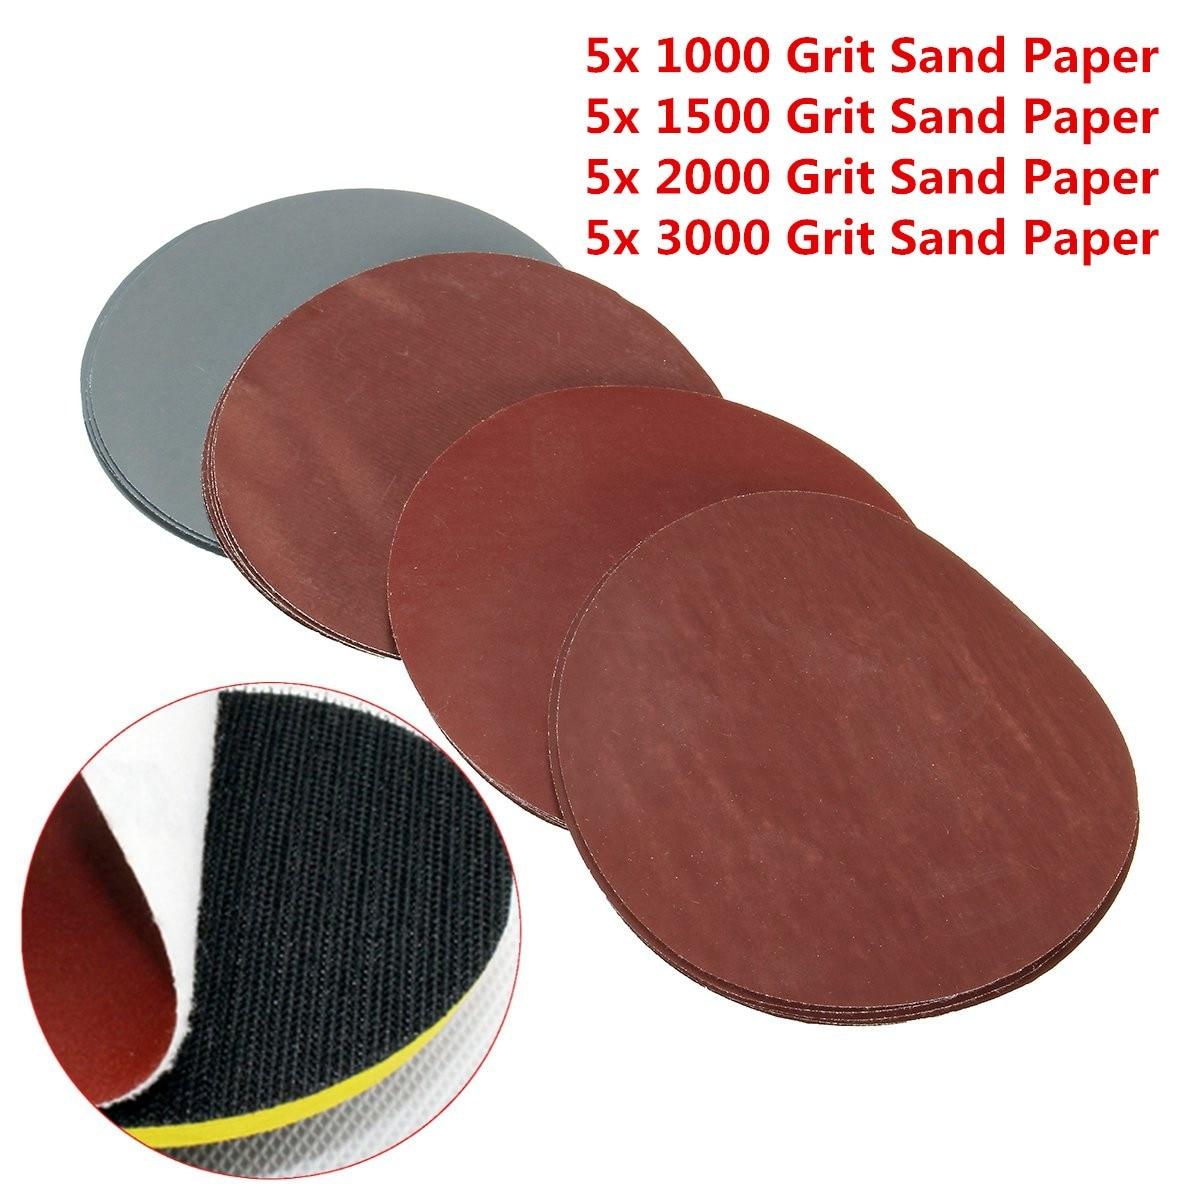 20Pcs 5inch 123mm Round Sanding Discs 1000# 1500# 2000# 3000# Grit Hook Loop Polishing Sandpaper Abrasive Tool For Wood Metal